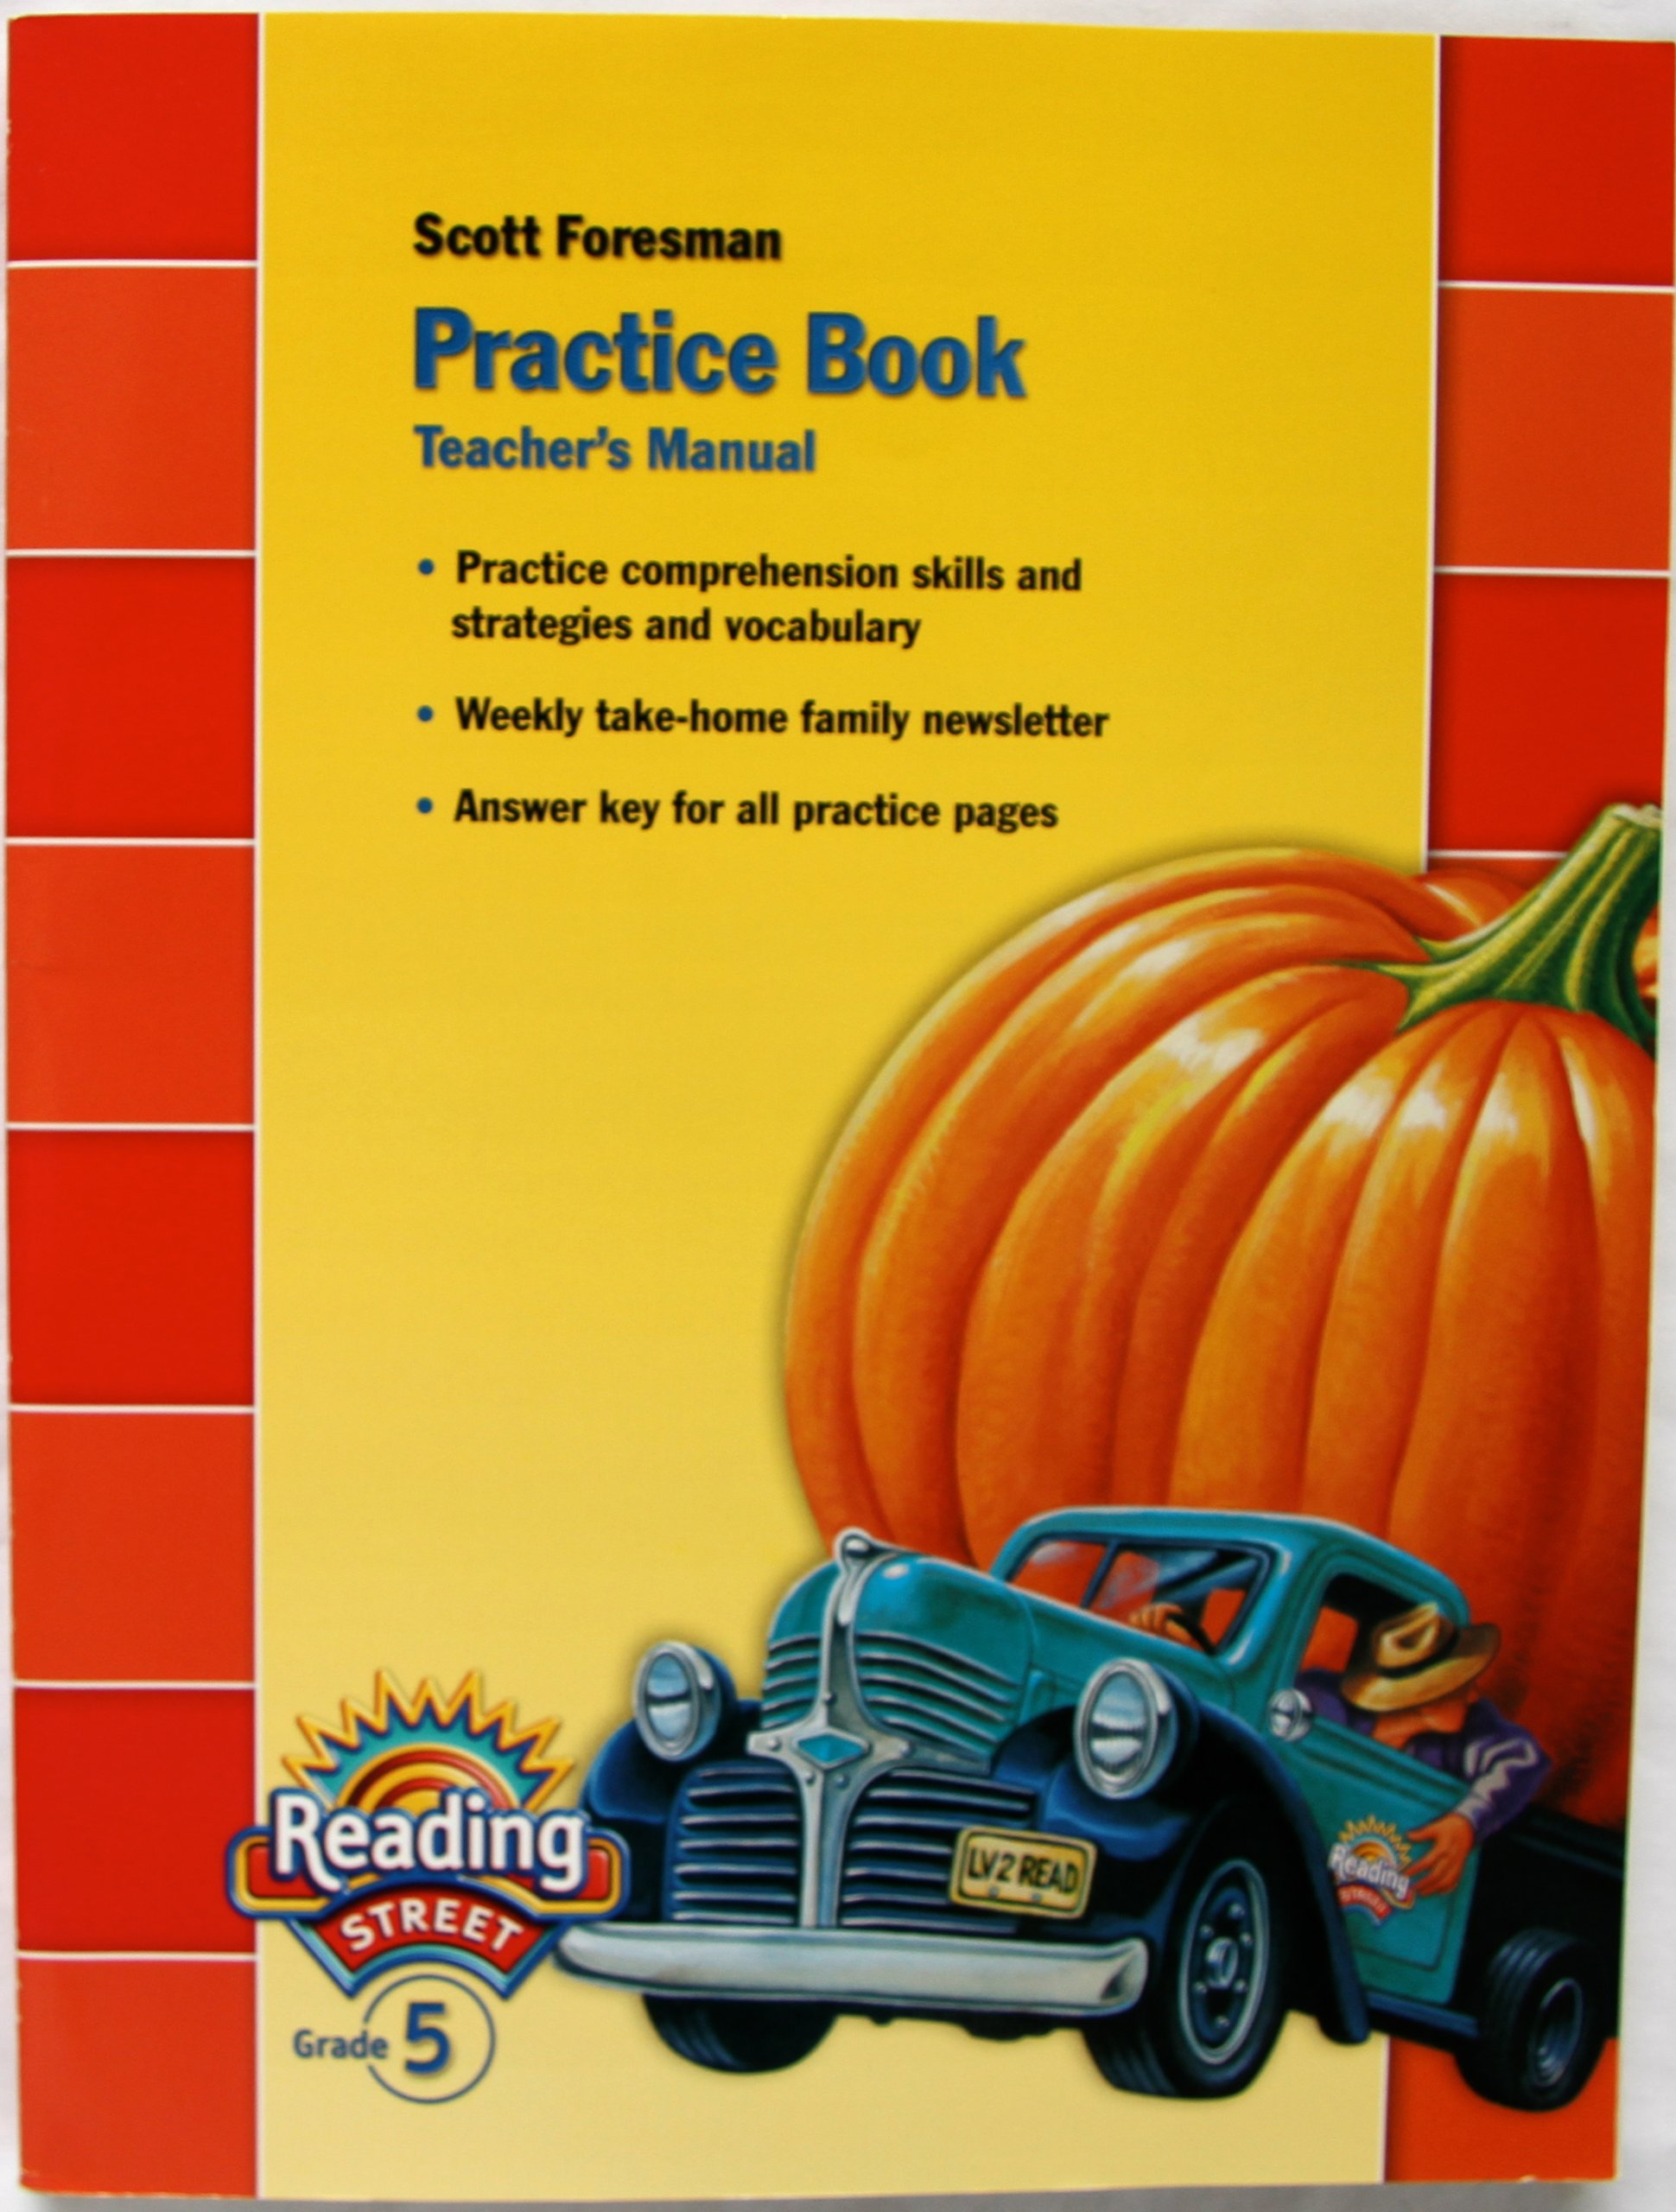 Worksheet Reading Books For Grade 5 amazon com practice book reading street grade 5 teachers manual 9780328145379 scott foresman books